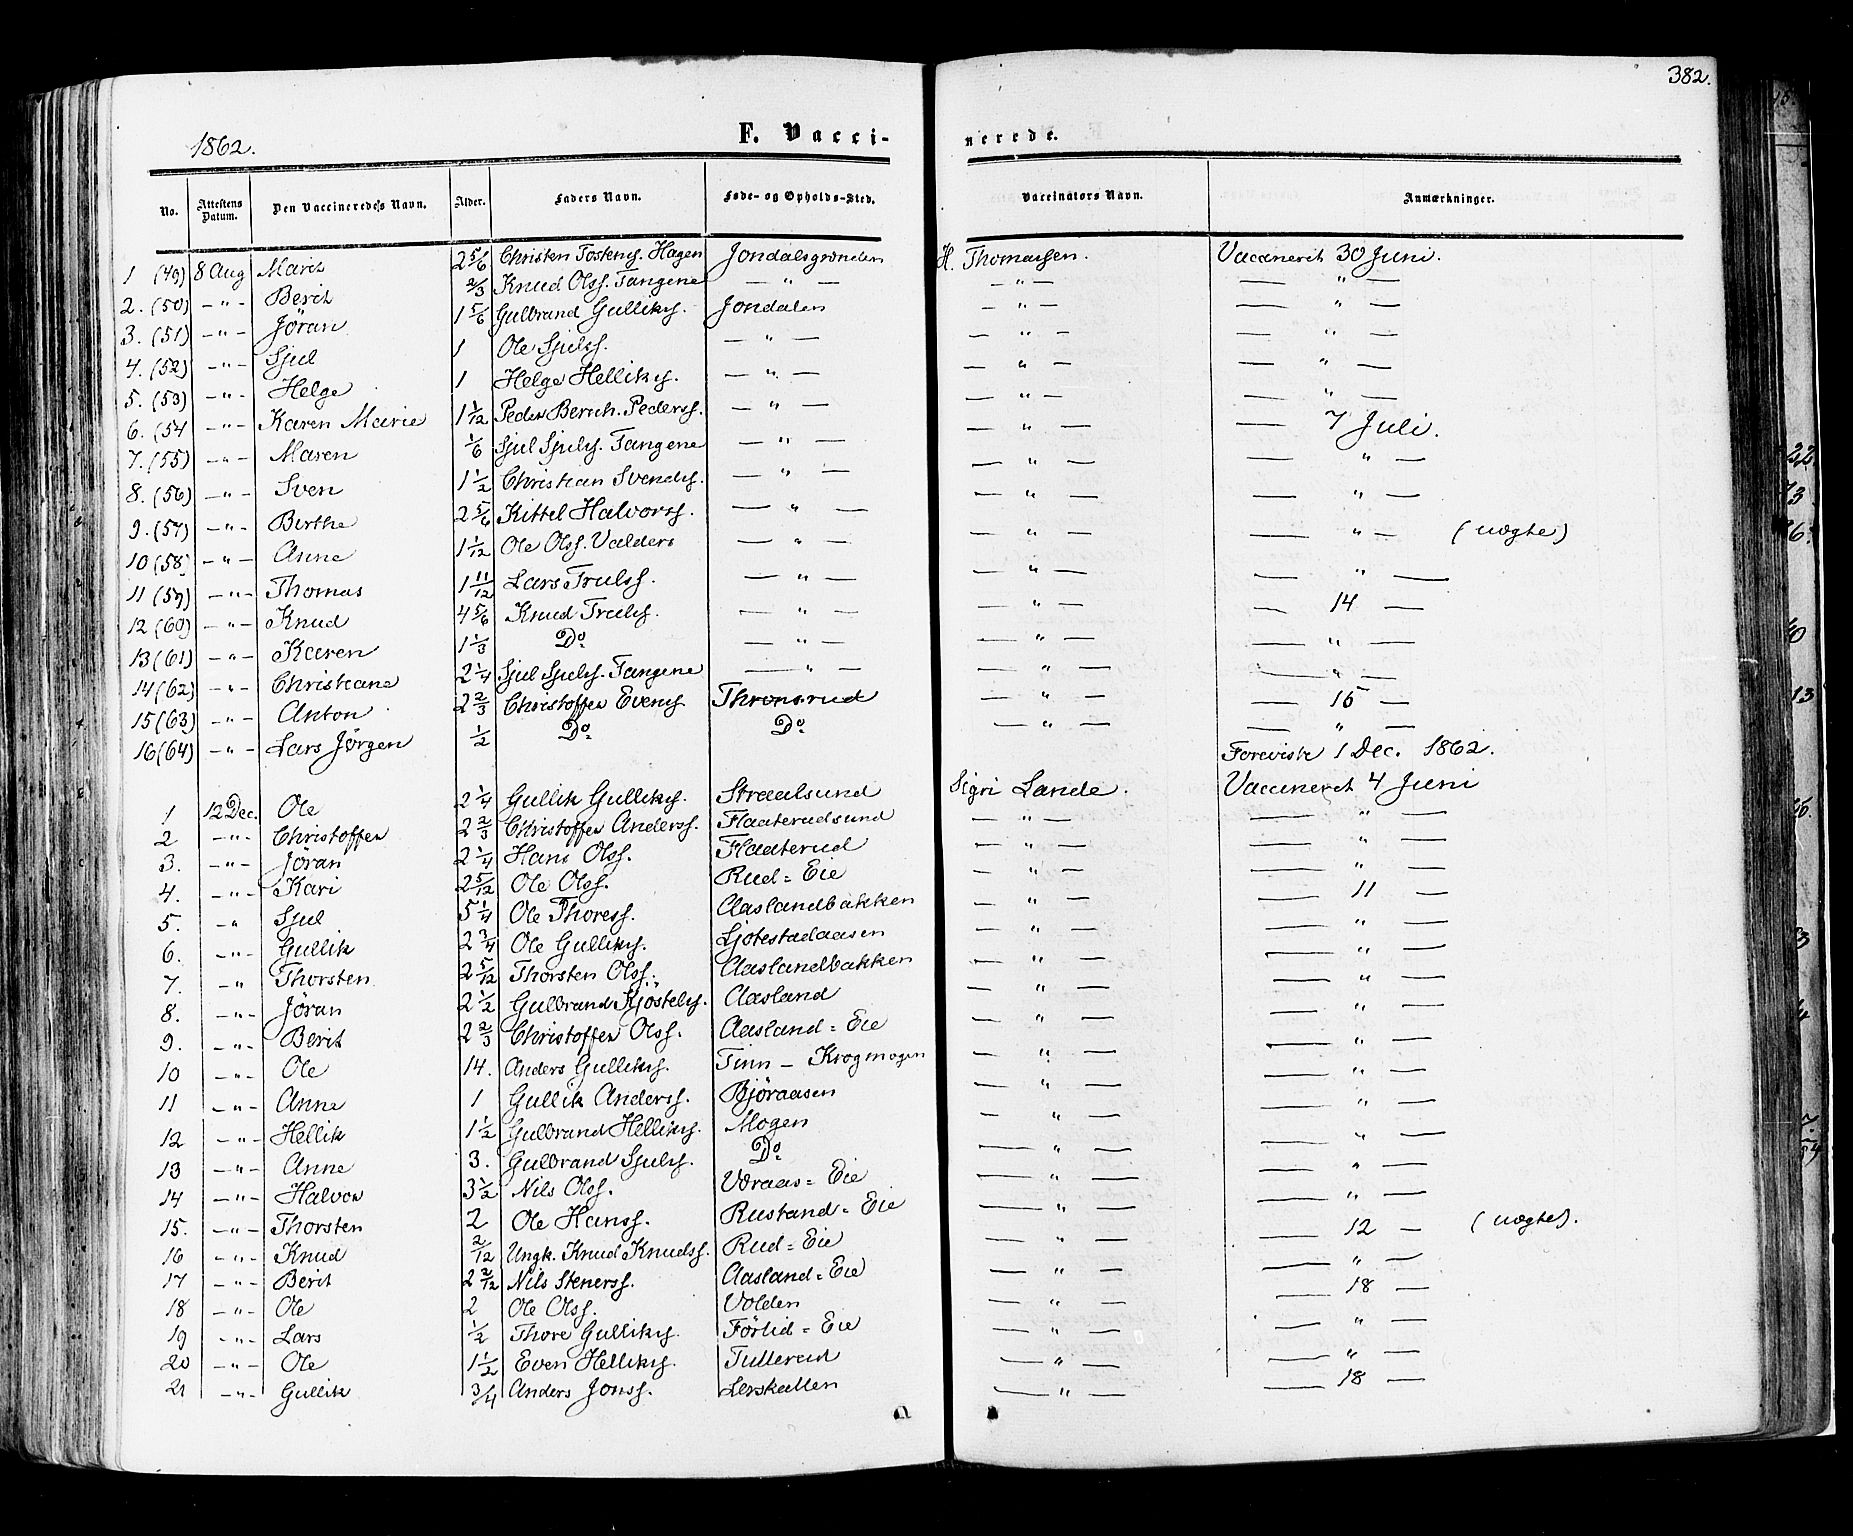 SAKO, Flesberg kirkebøker, F/Fa/L0007: Ministerialbok nr. I 7, 1861-1878, s. 382